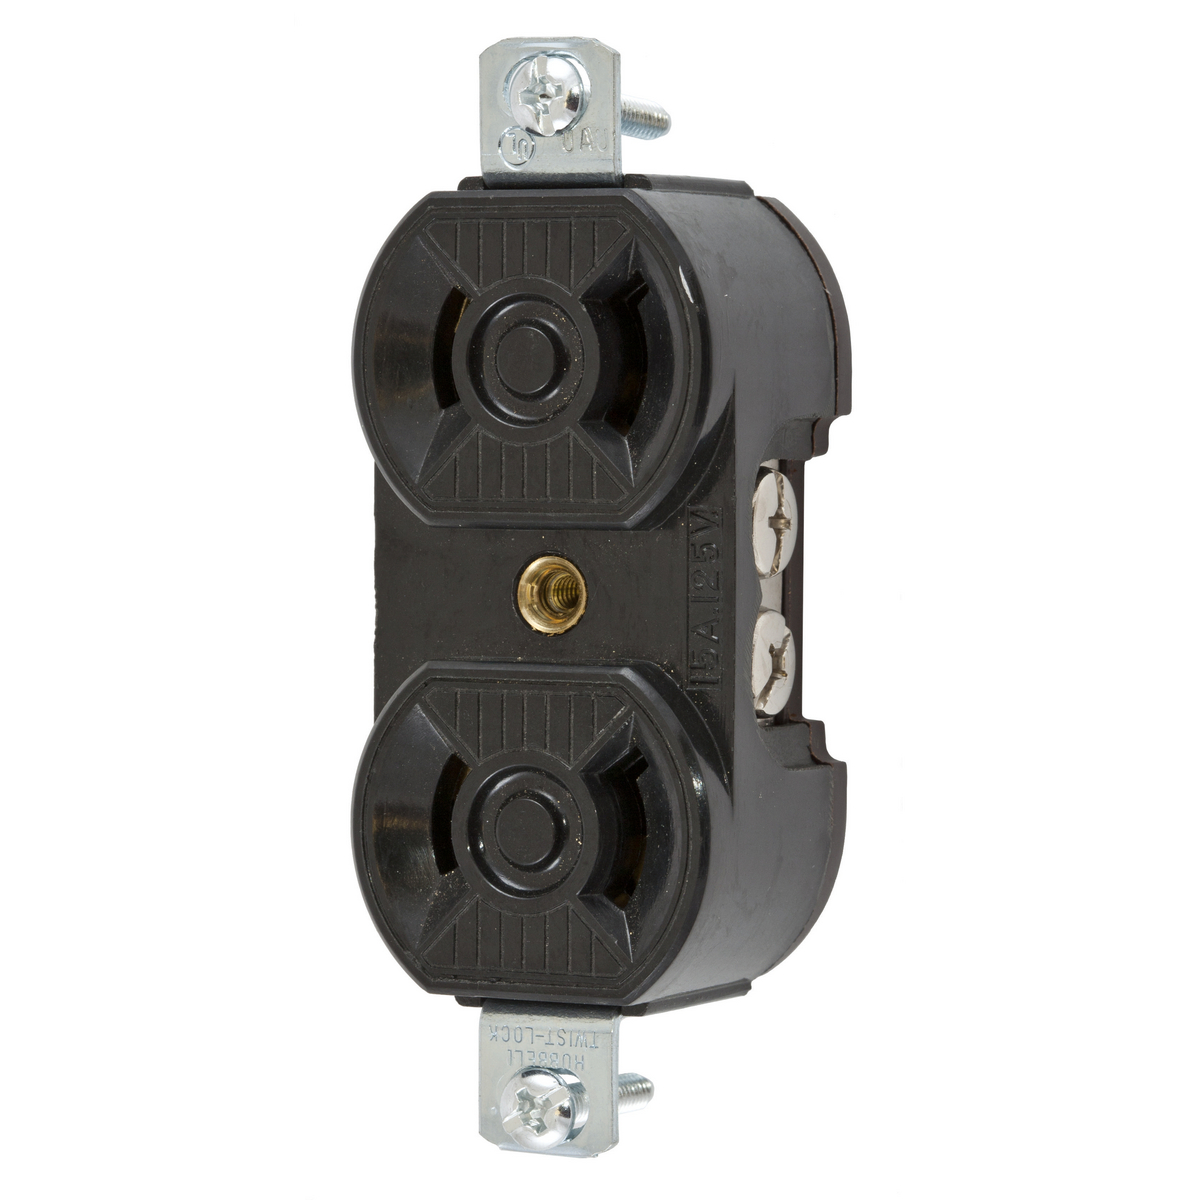 Hubbell HBL7540 15 Amp 125 Volt 2-Pole 2-Wire NEMA L1-15R Black Locking Duplex Receptacle